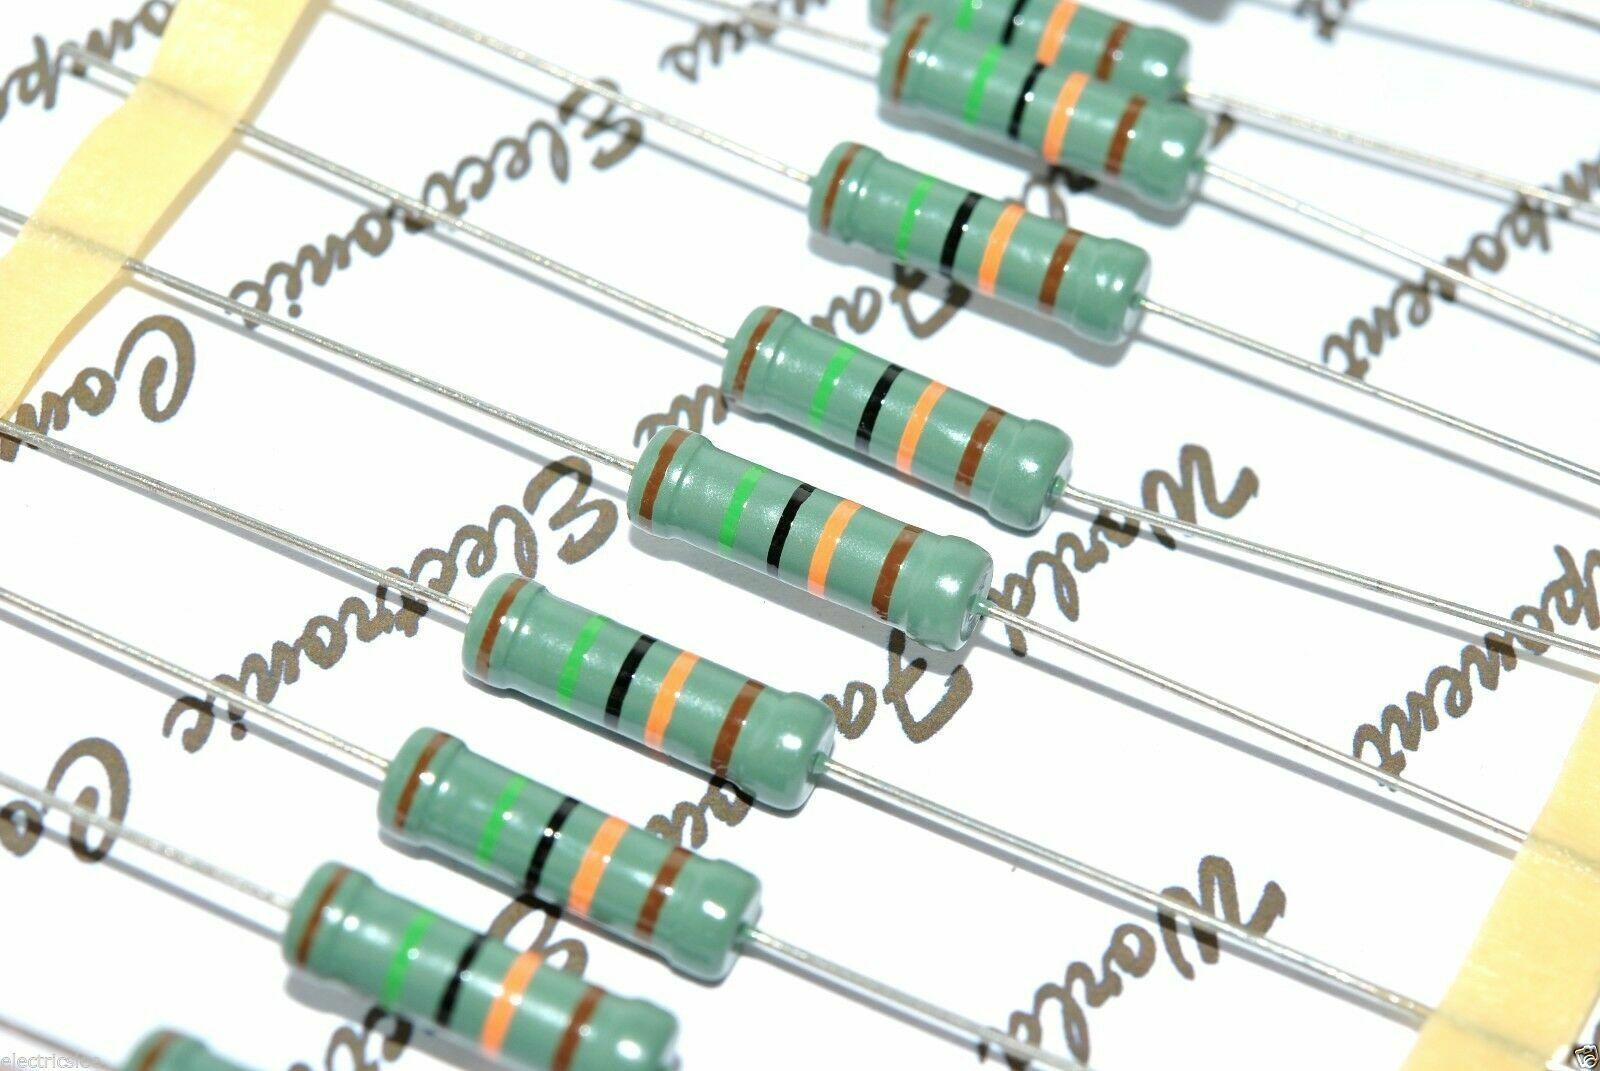 2pcs PHILIPS MR52 2K 1W 1/% 500V Metal Film Resistor Non-RoHS NOS